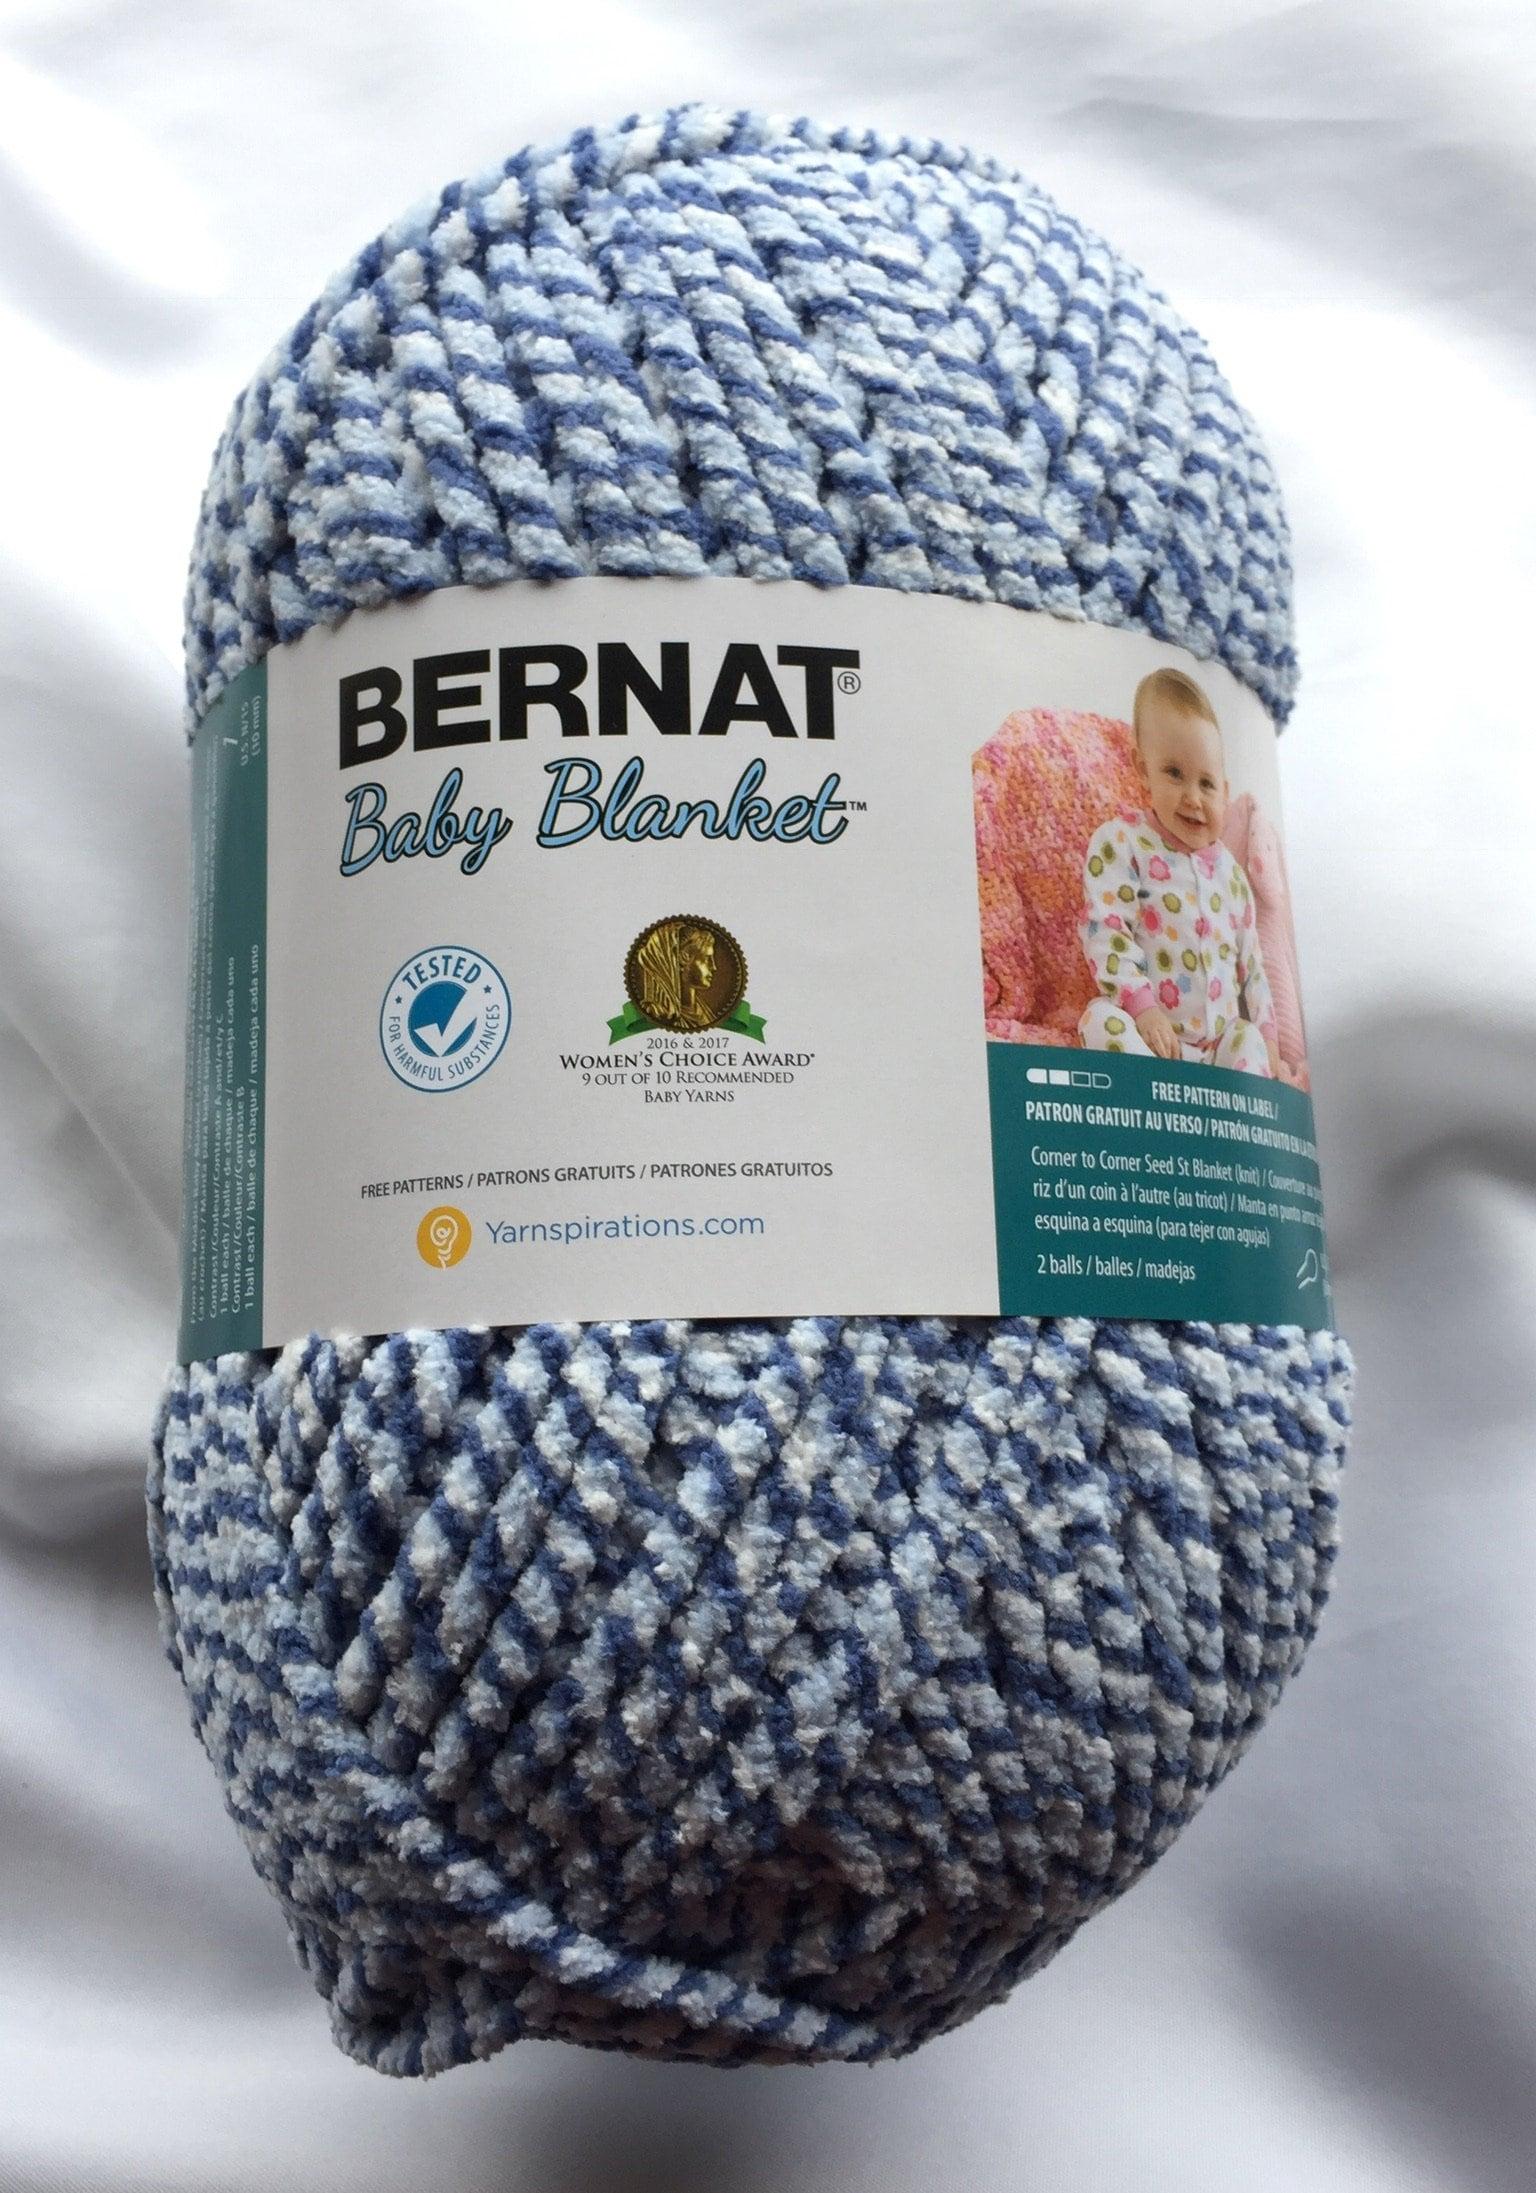 Blue Twist 10002 Bernat Baby Blanket Yarn 220yds ~ 10 5 oz ~300g Super  Bulky(6) ~ Blue Yarn for Boys Crochet ~ Knitting Supply ~Easy Care